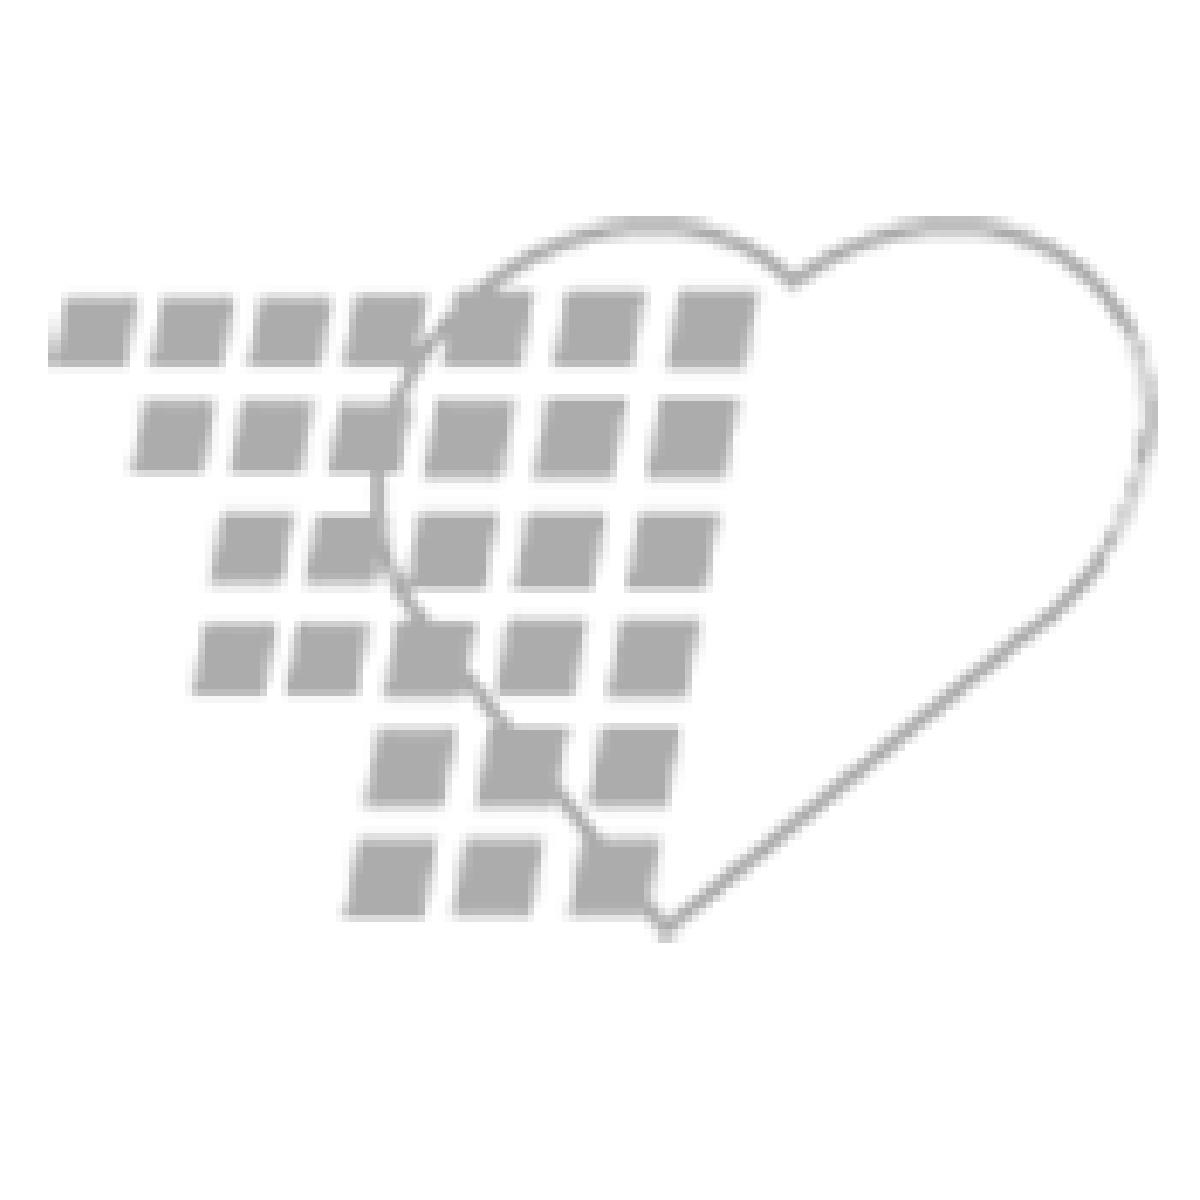 "06-26-2560 B. Braun Introcan Safety® IV Catheter - 18G x 1.25"" FEP Straight"